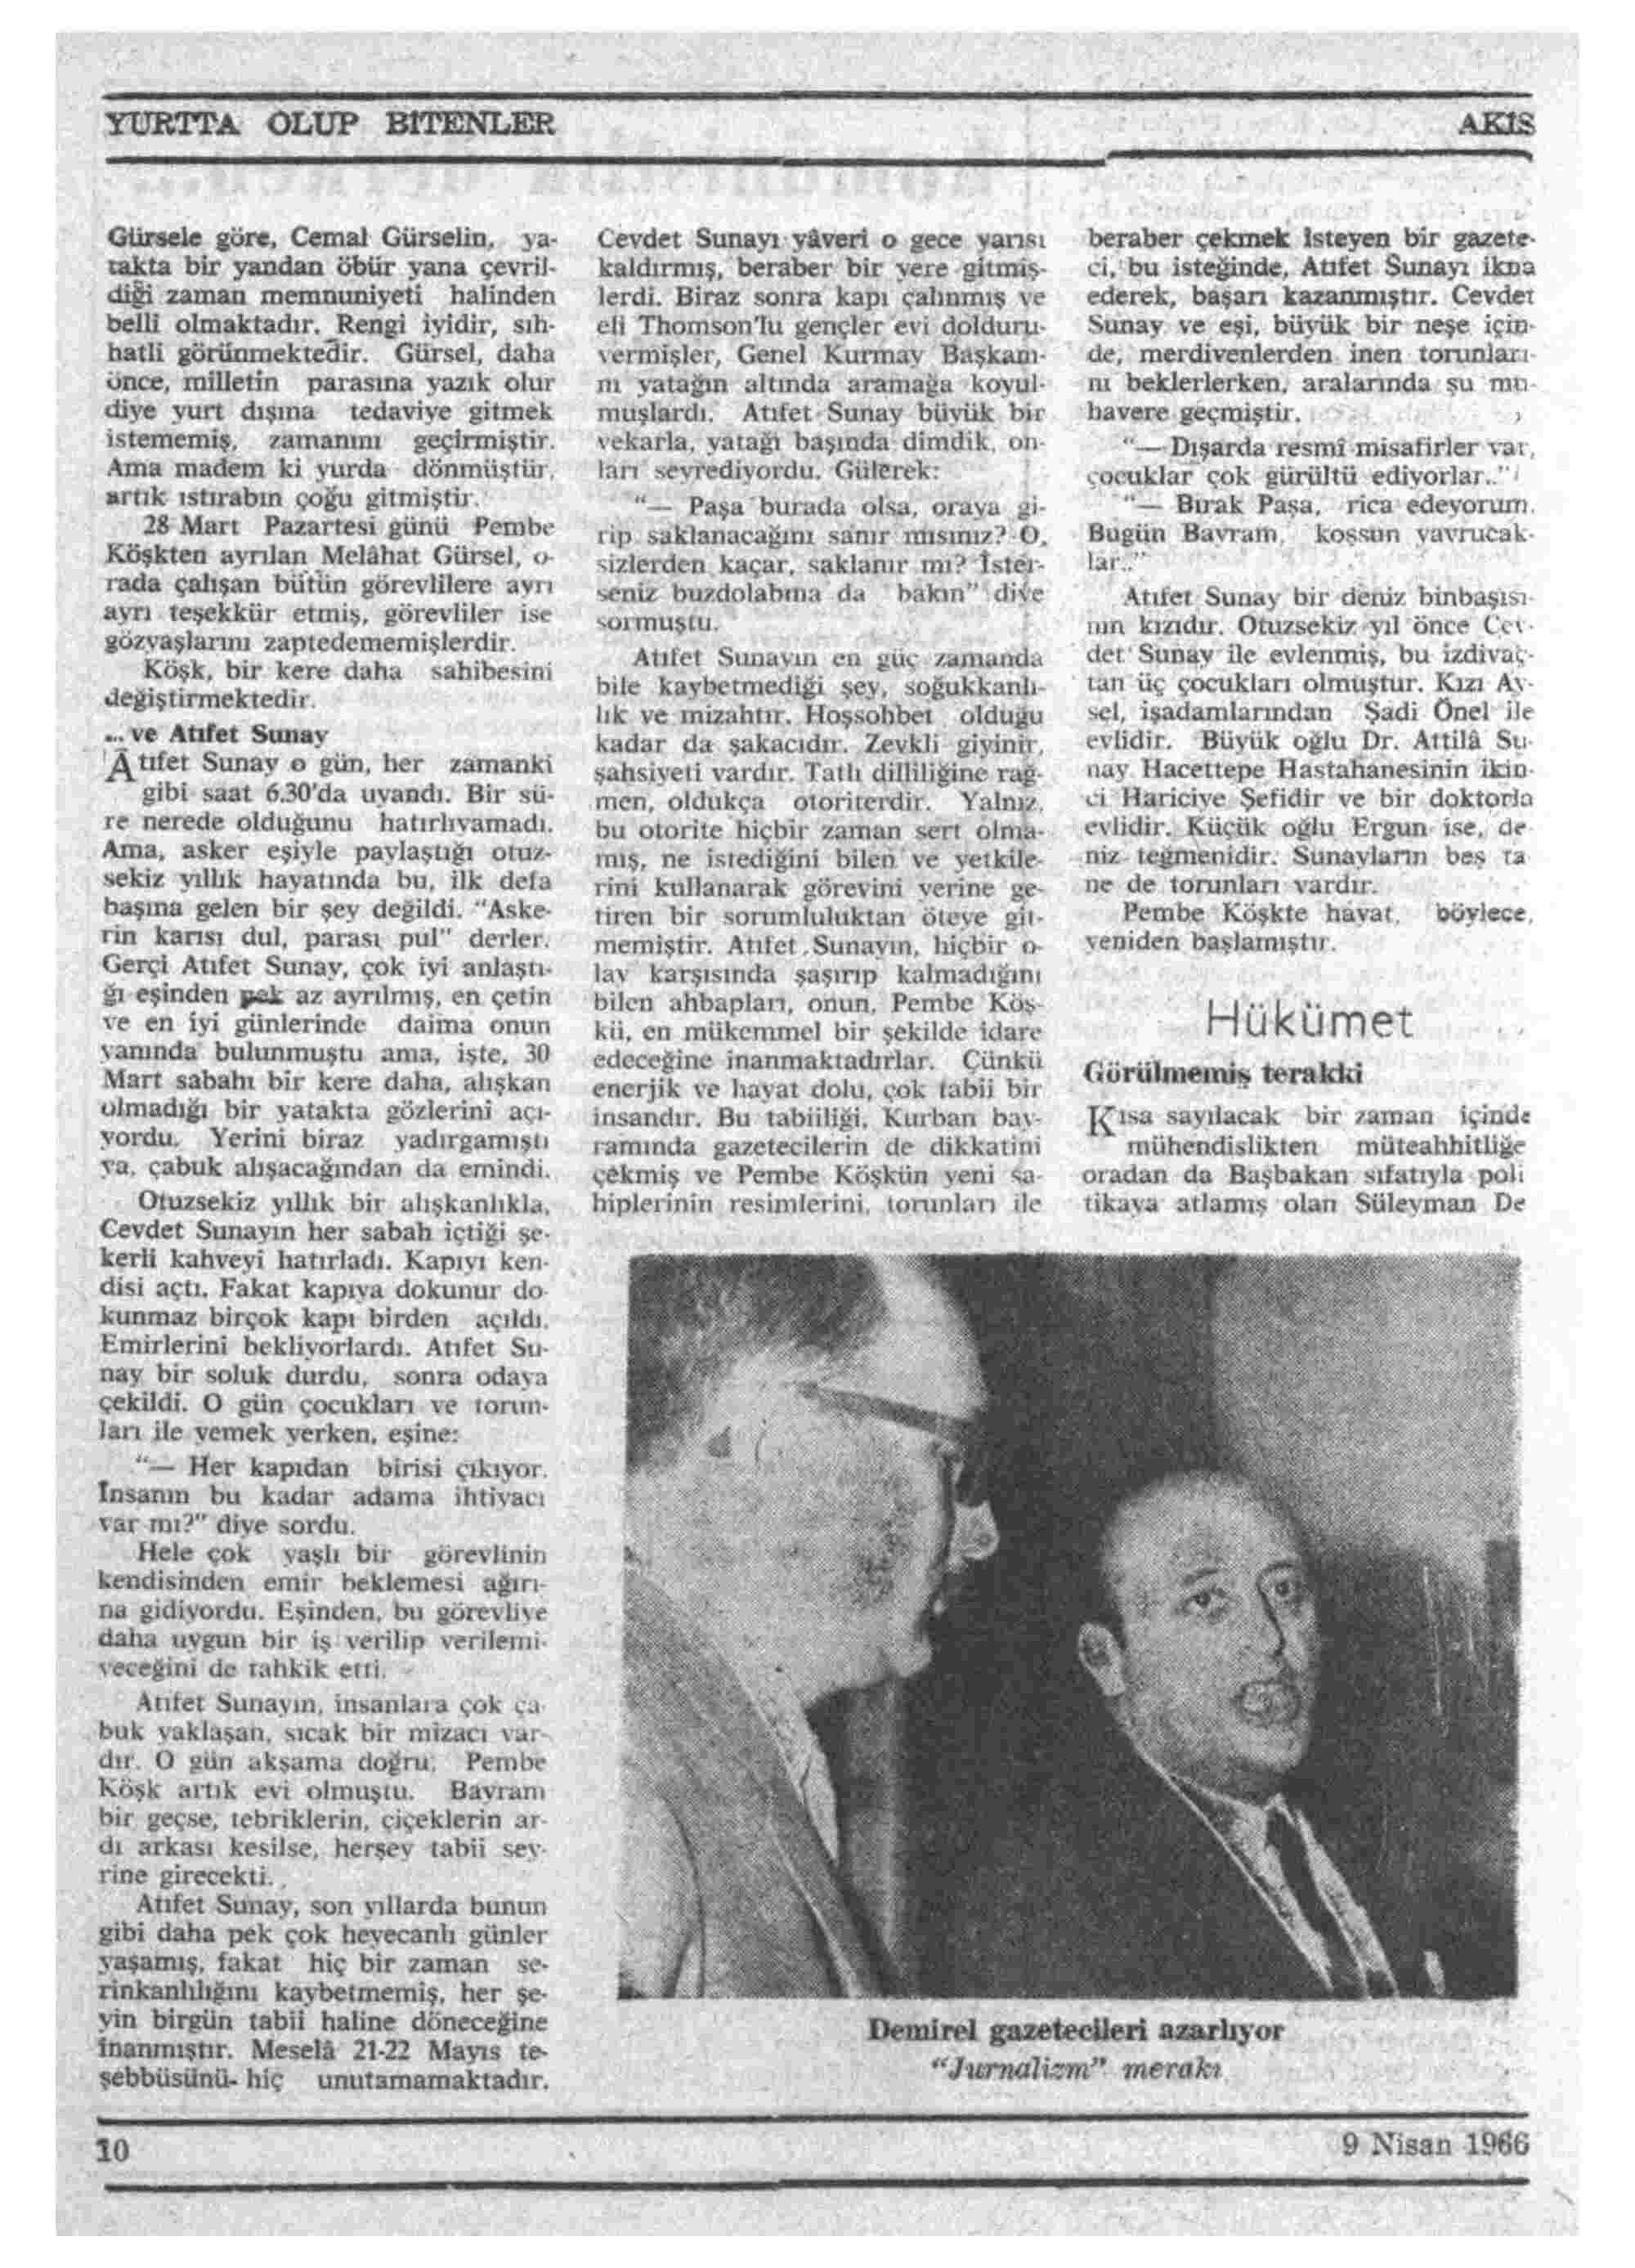 9 Nisan 1966 Tarihli Akis Dergisi Sayfa 10